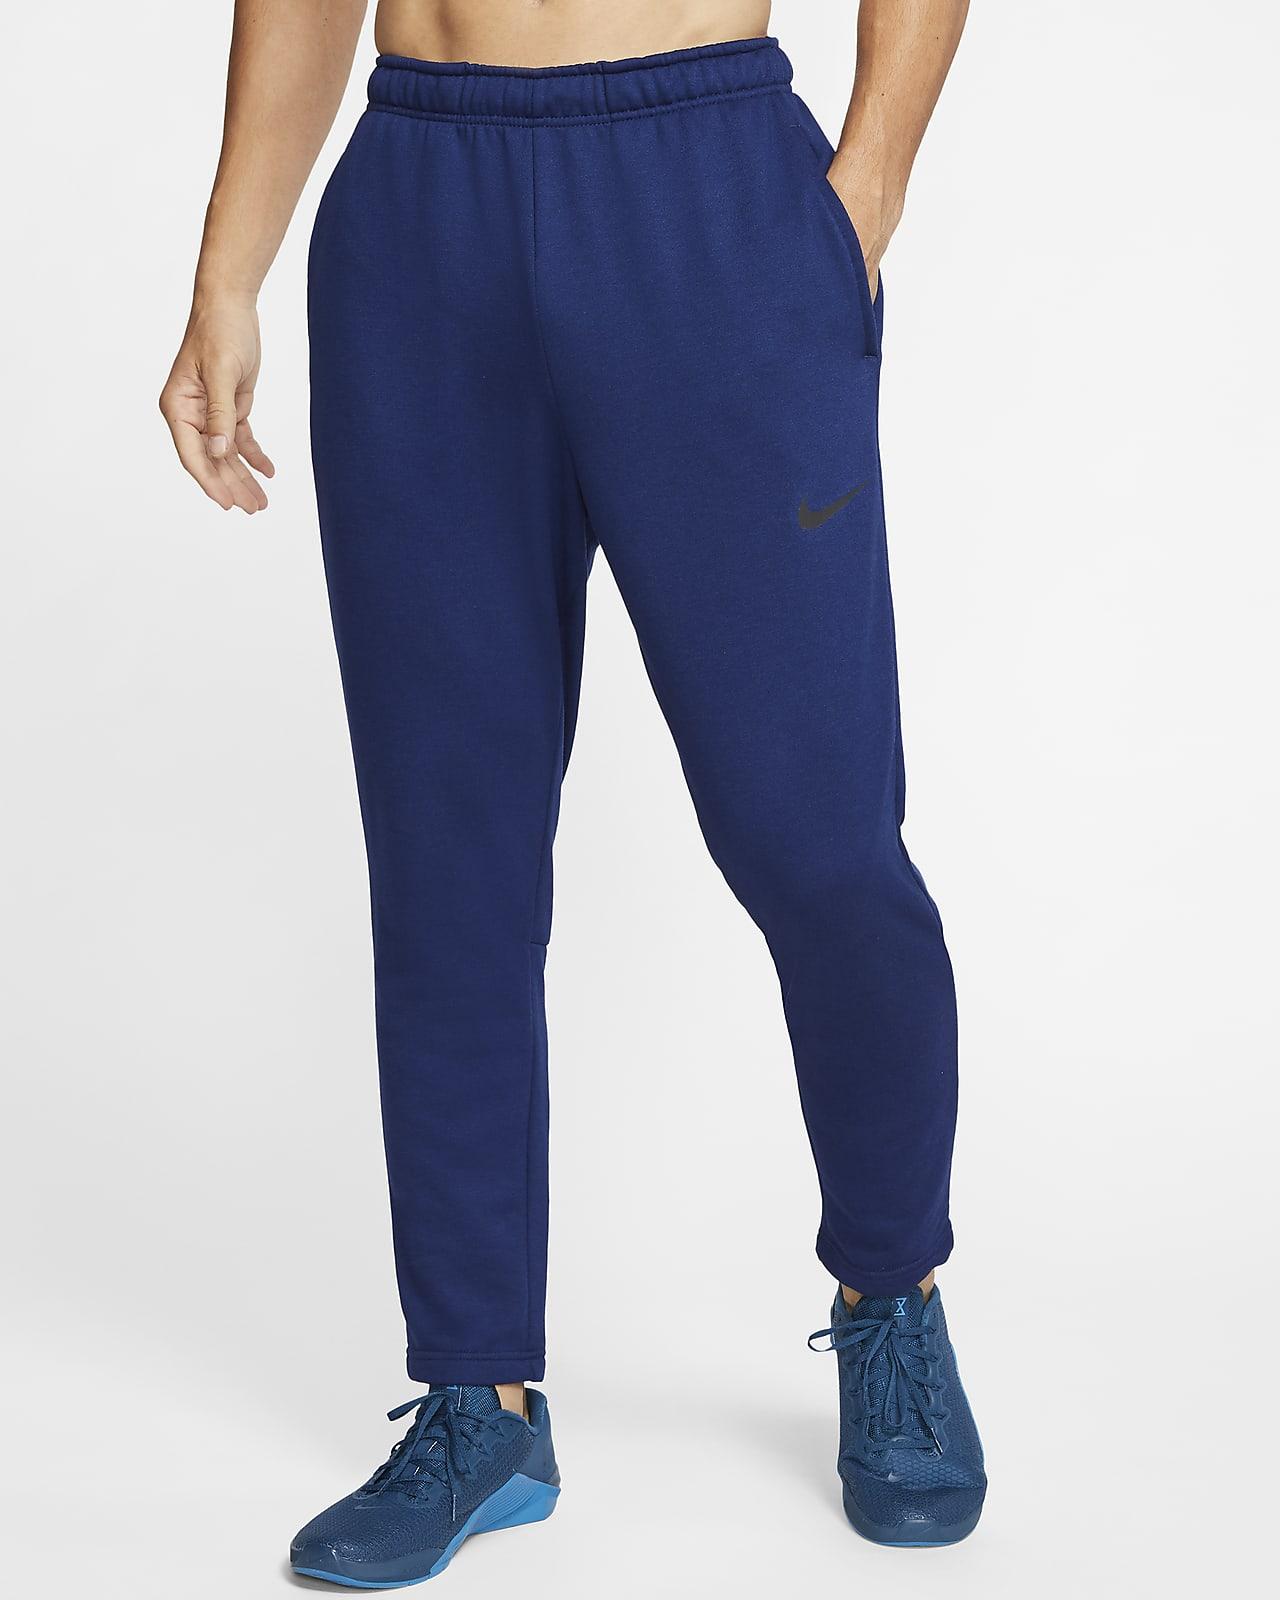 precio Estrictamente Lleno  Nike Dri-FIT Men's Fleece Training Pants. Nike.com